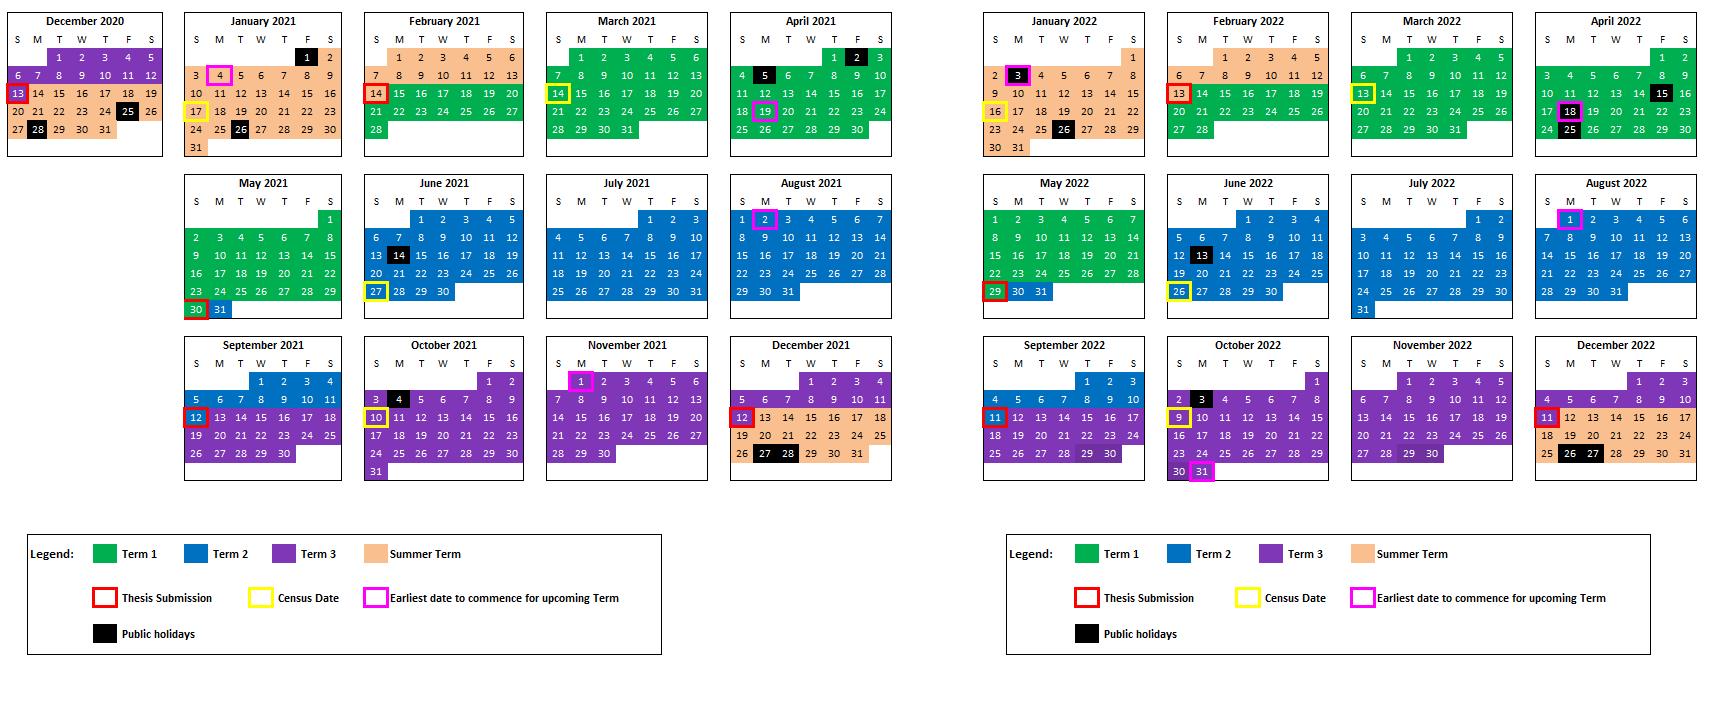 U Of U Academic Calendar 2022.Hdr Academic Calendar Unsw Research